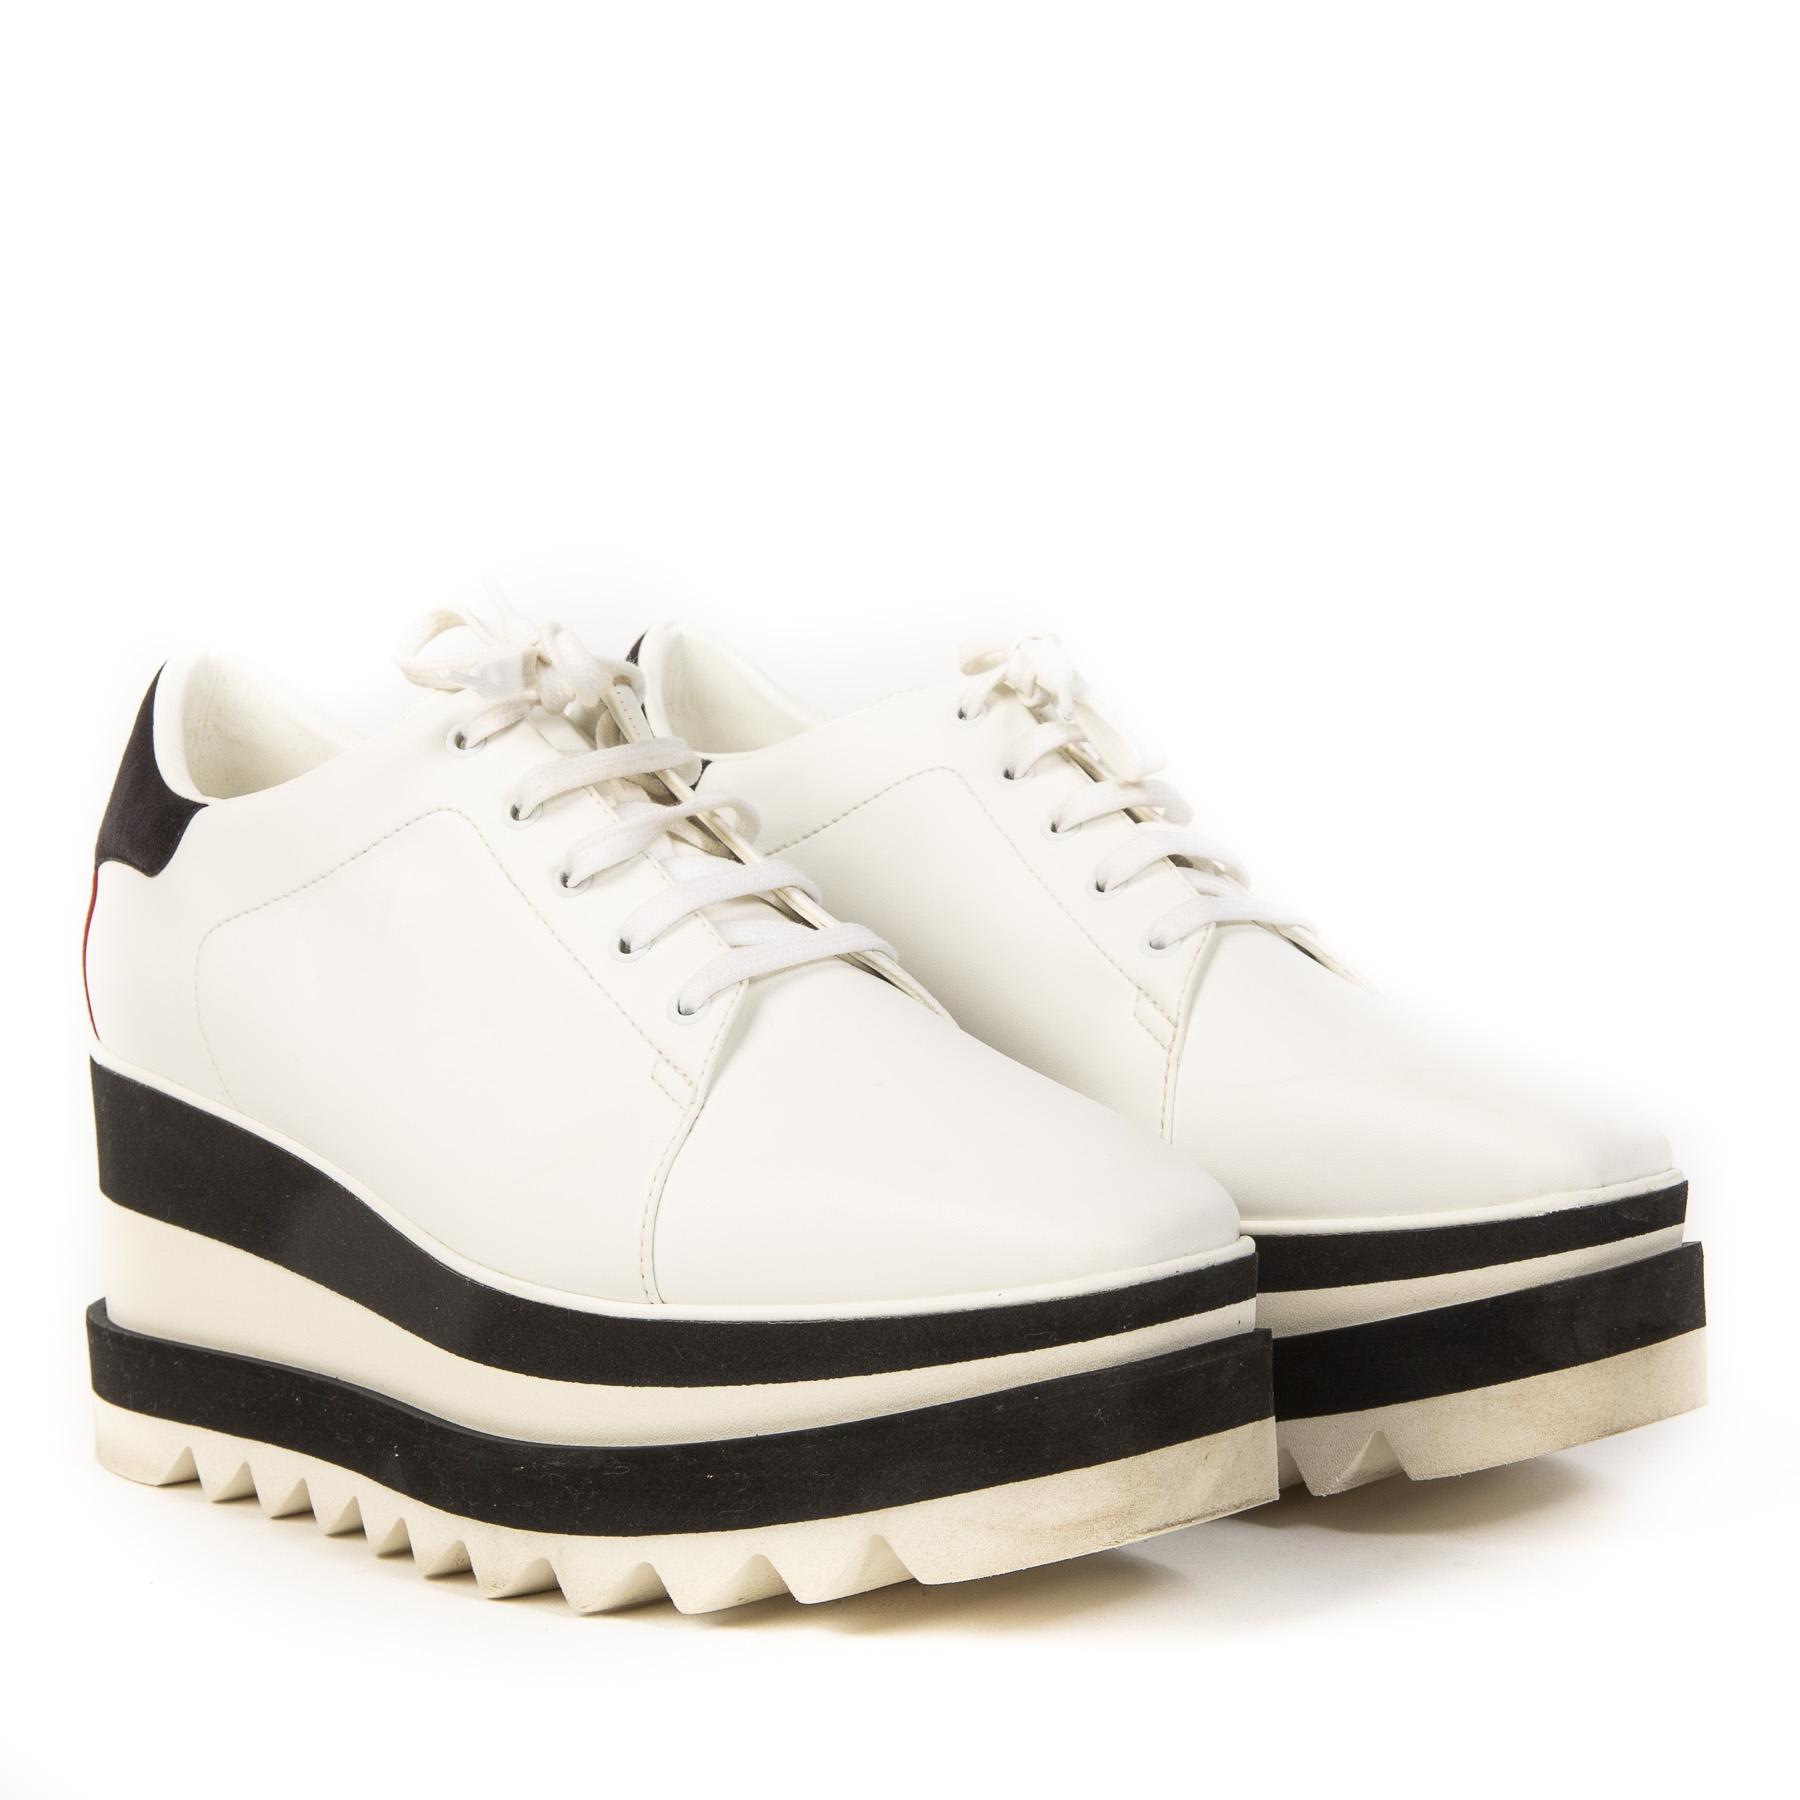 Authentieke Tweedehands Stella McCartney Black White Elyse Shoes juiste prijs veilig online shoppen luxe merken webshop Antwerpen België fashion mode